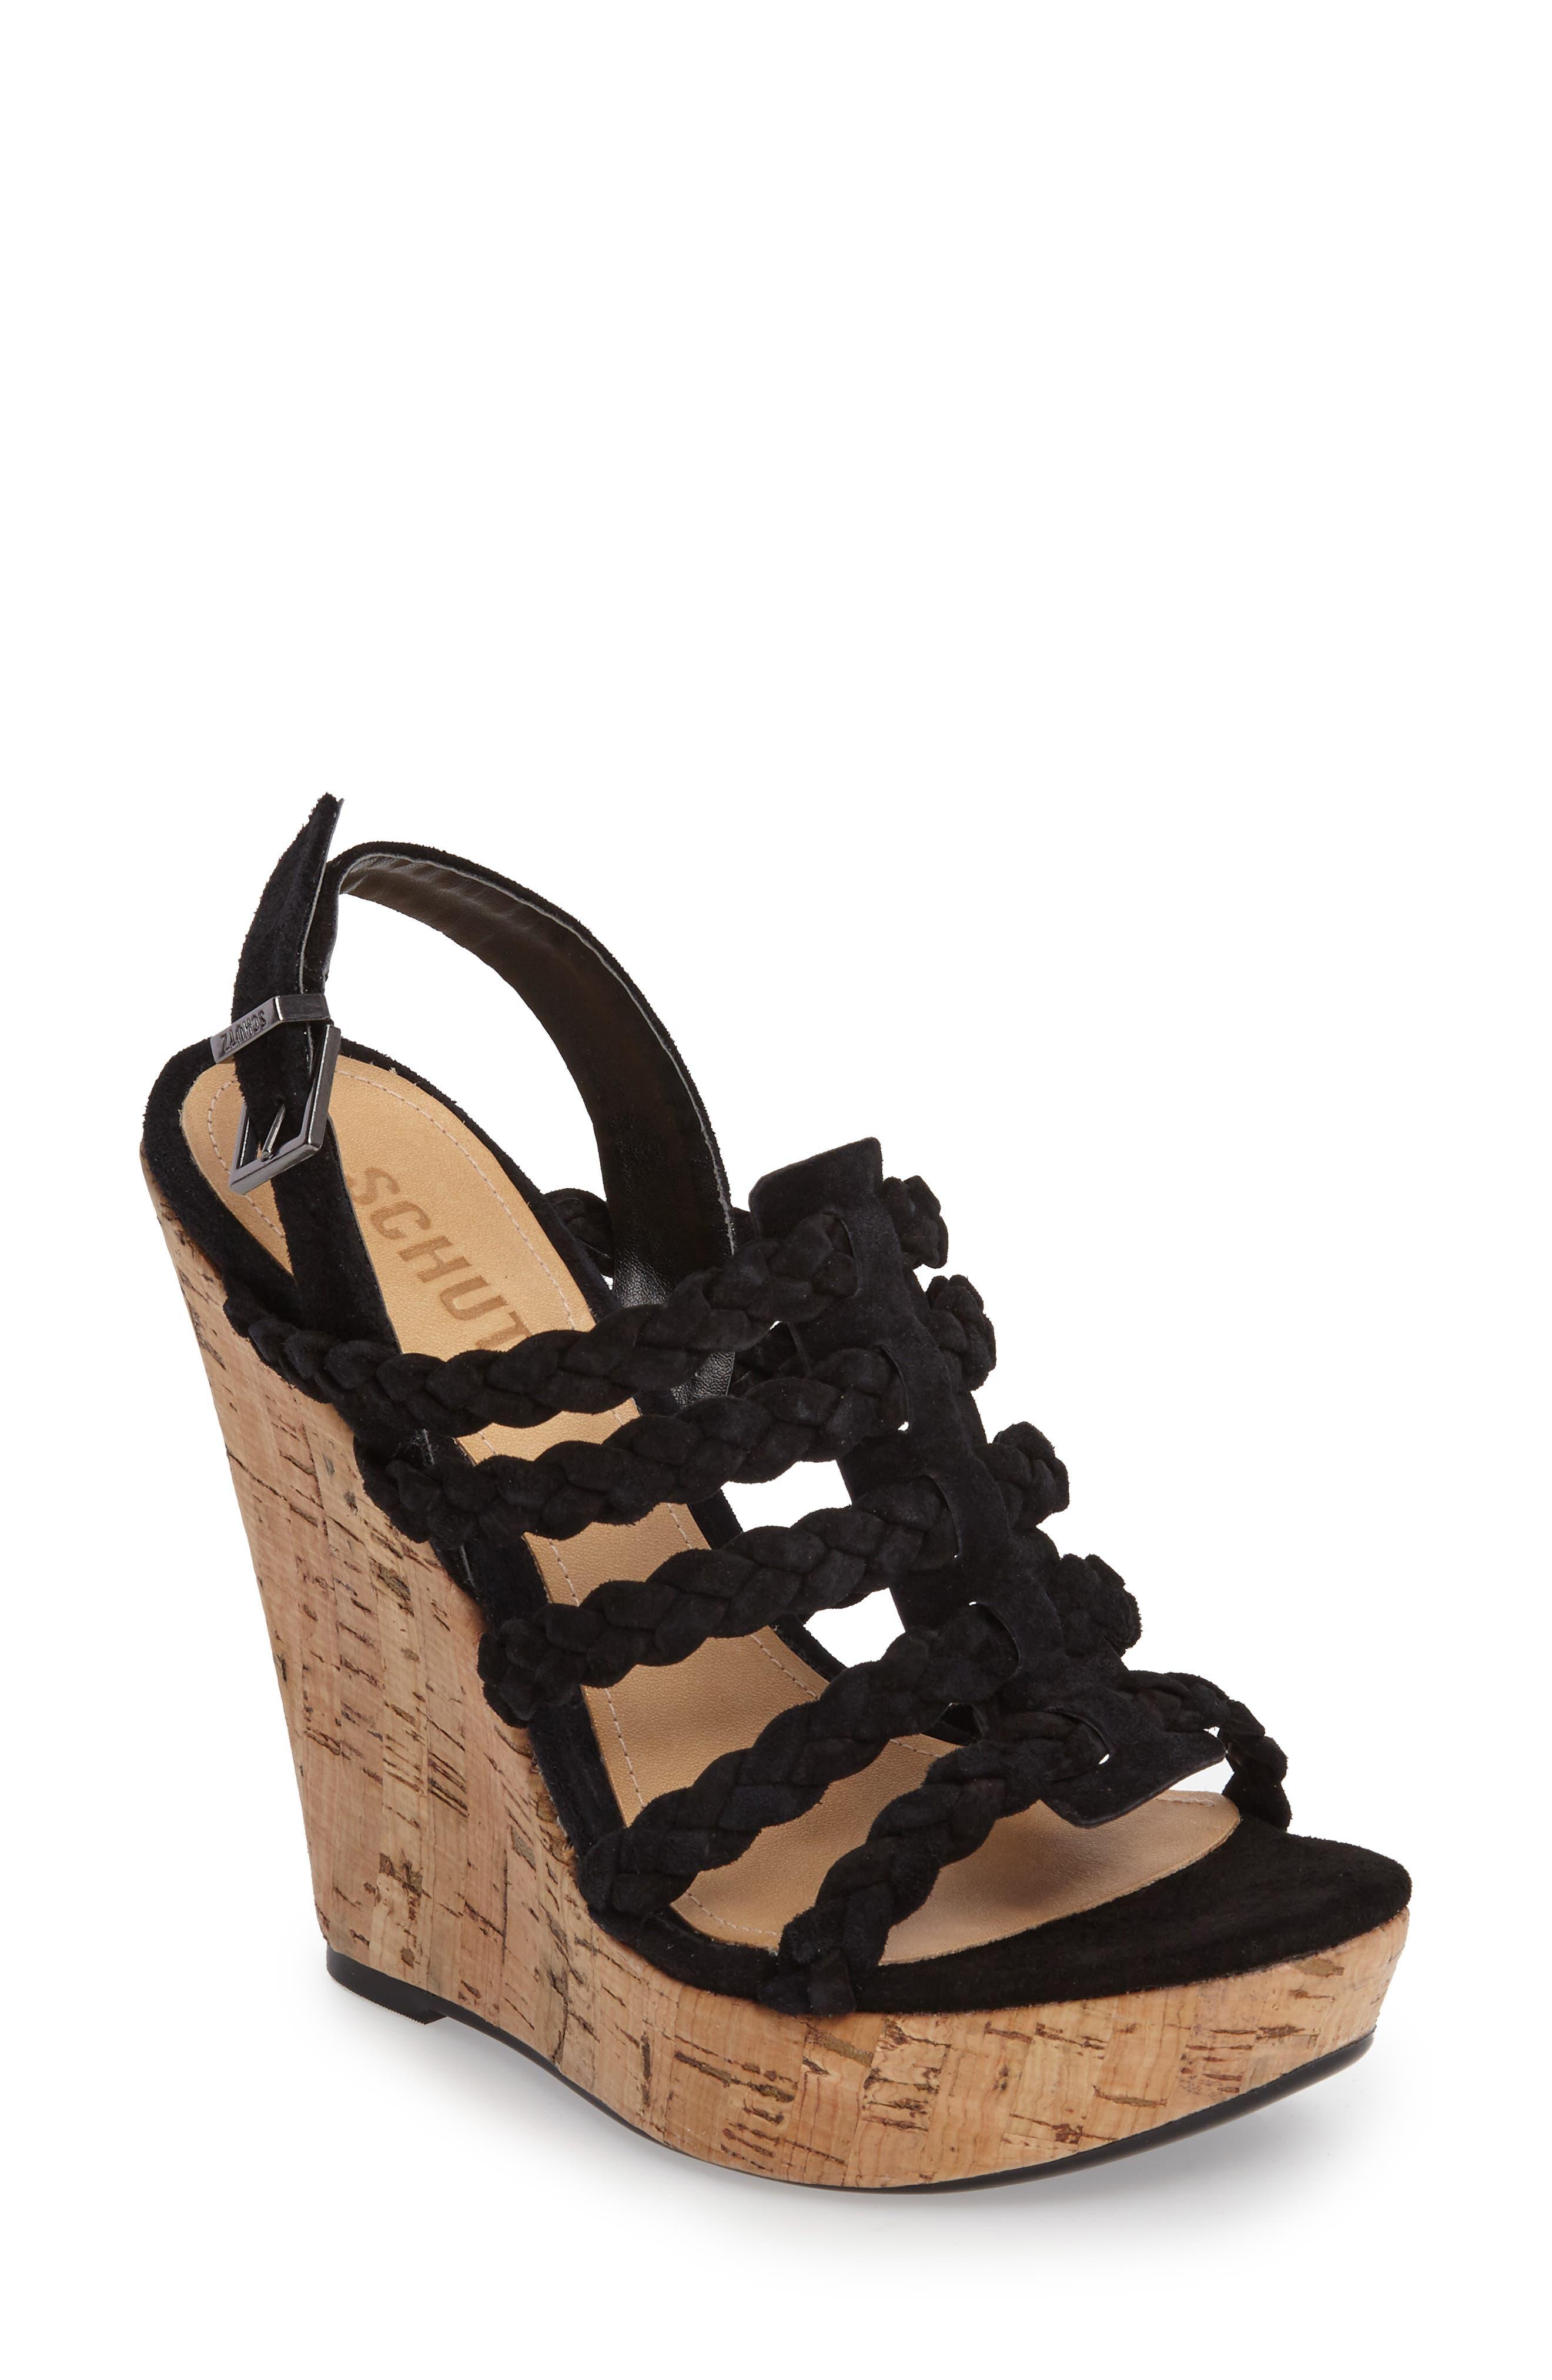 Abigally Wedge Sandal,                         Main,                         color, Black